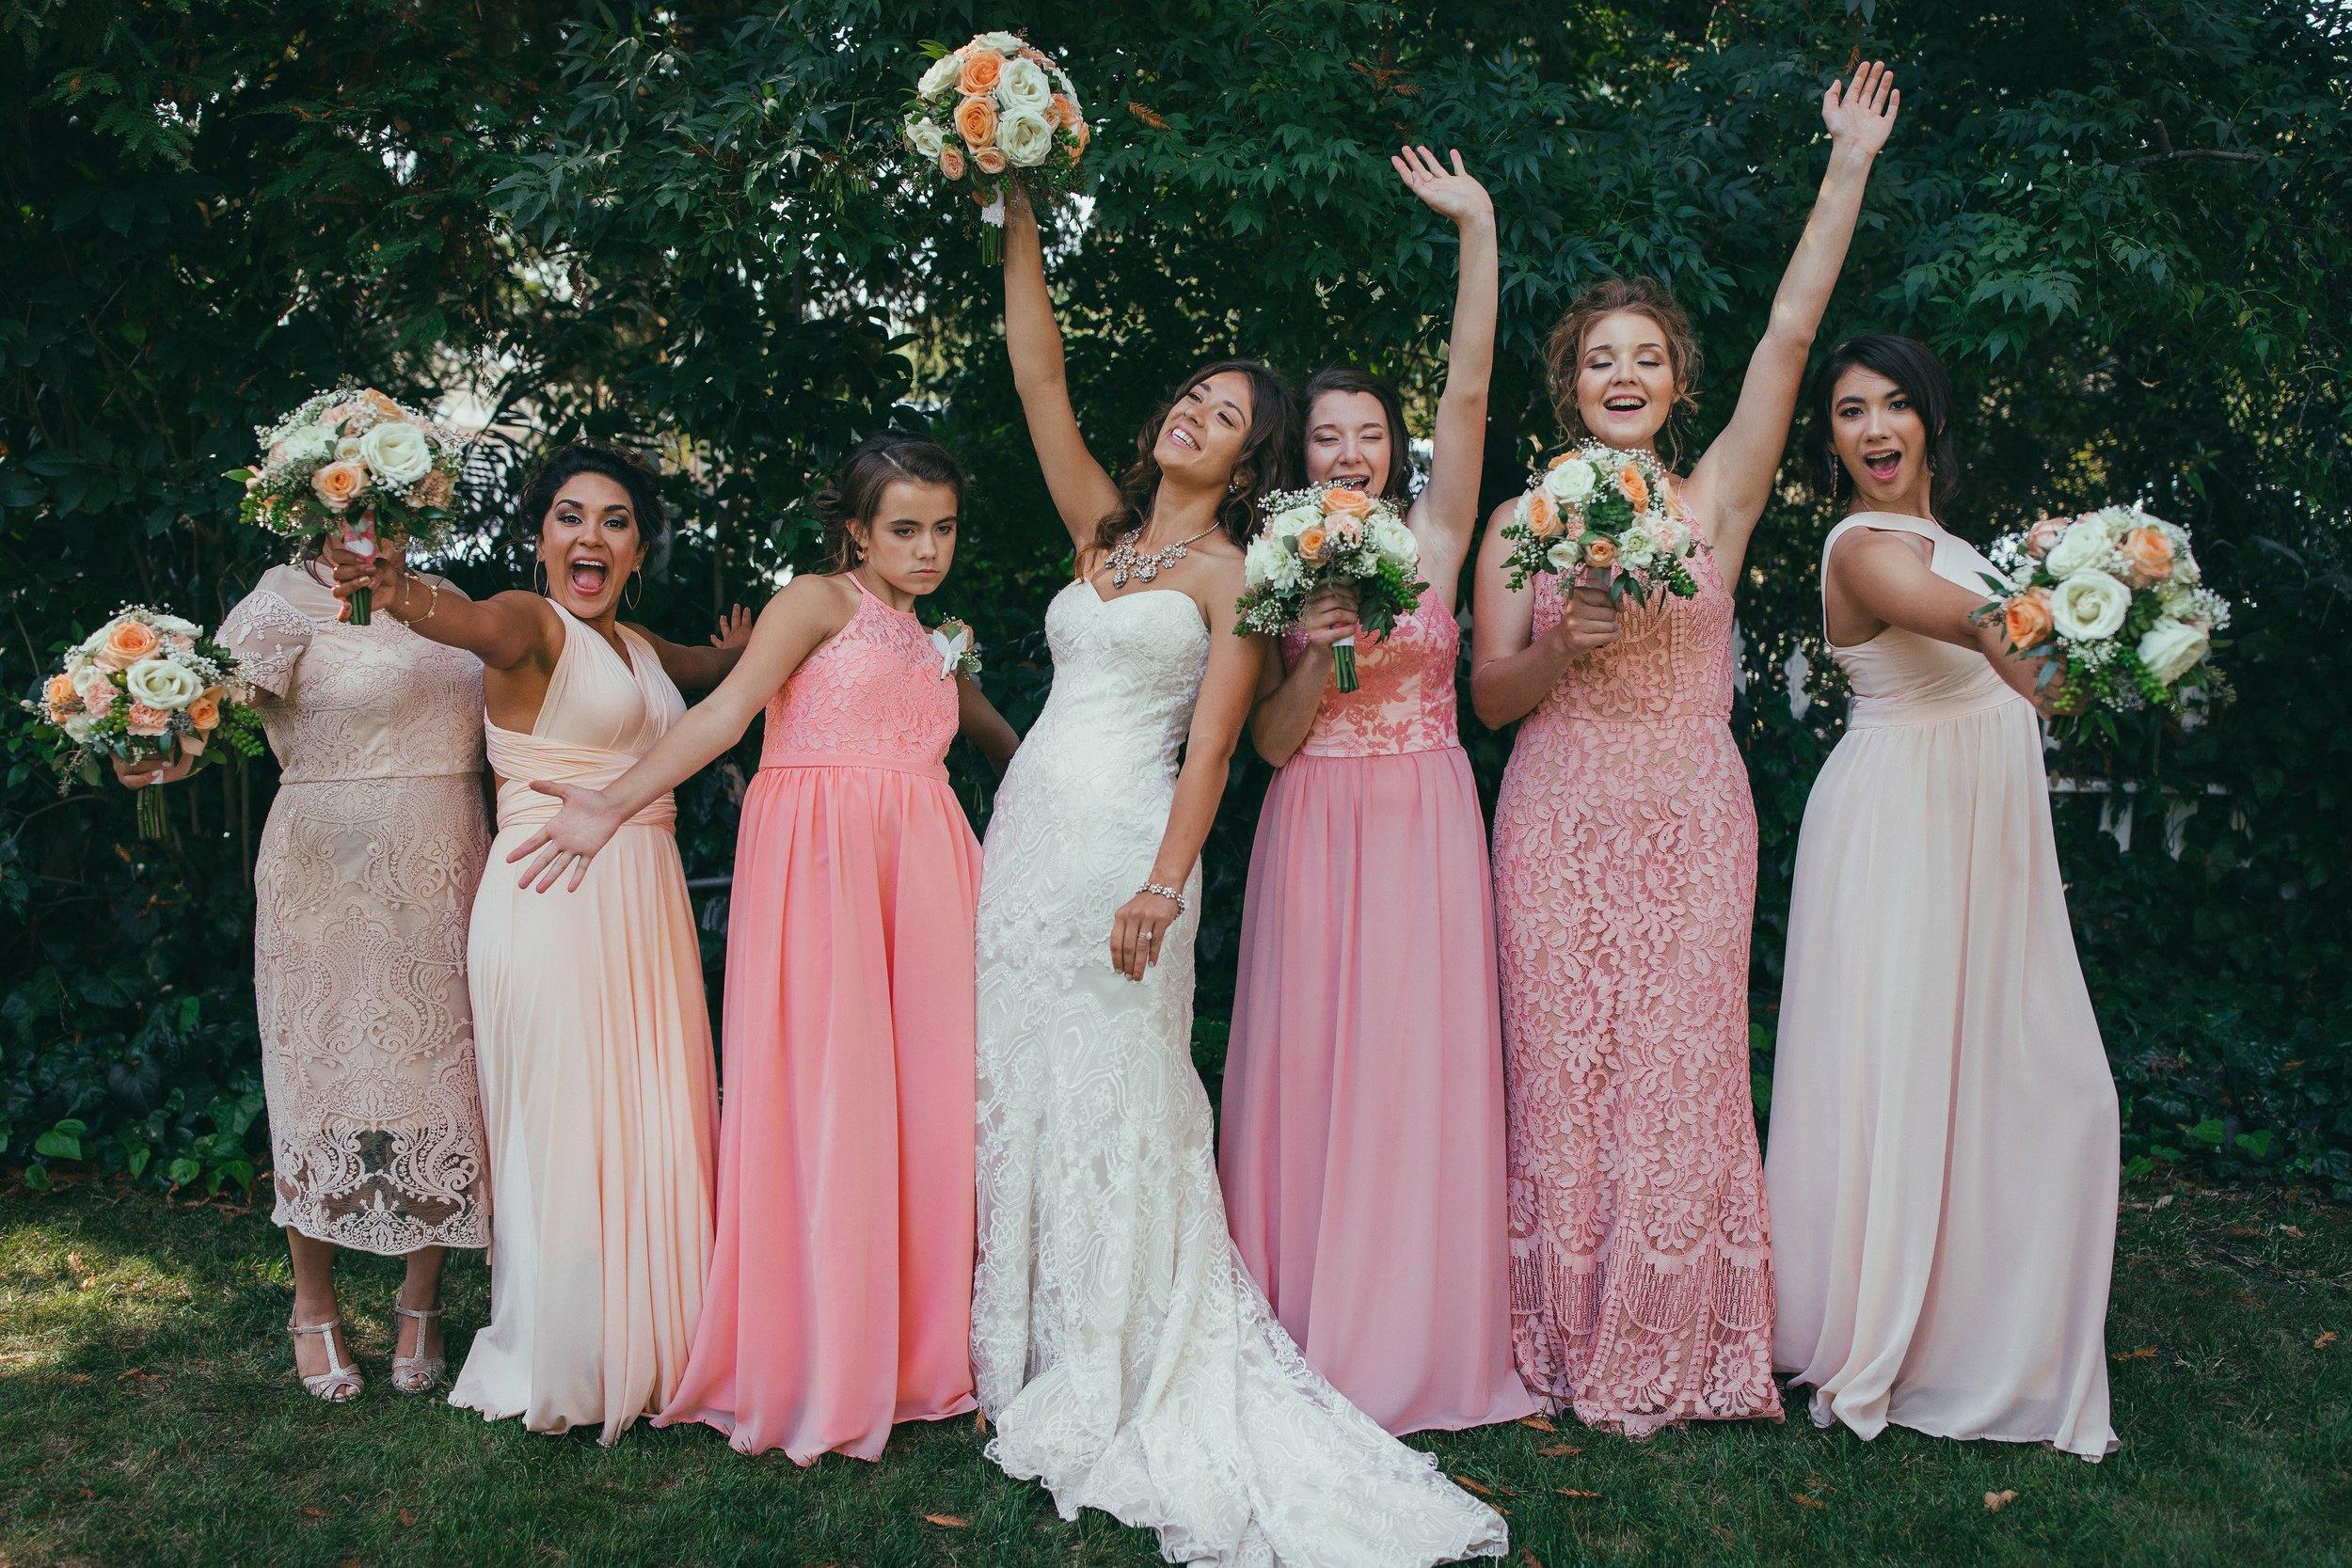 Evhan-Madi-Wedding-353.jpg